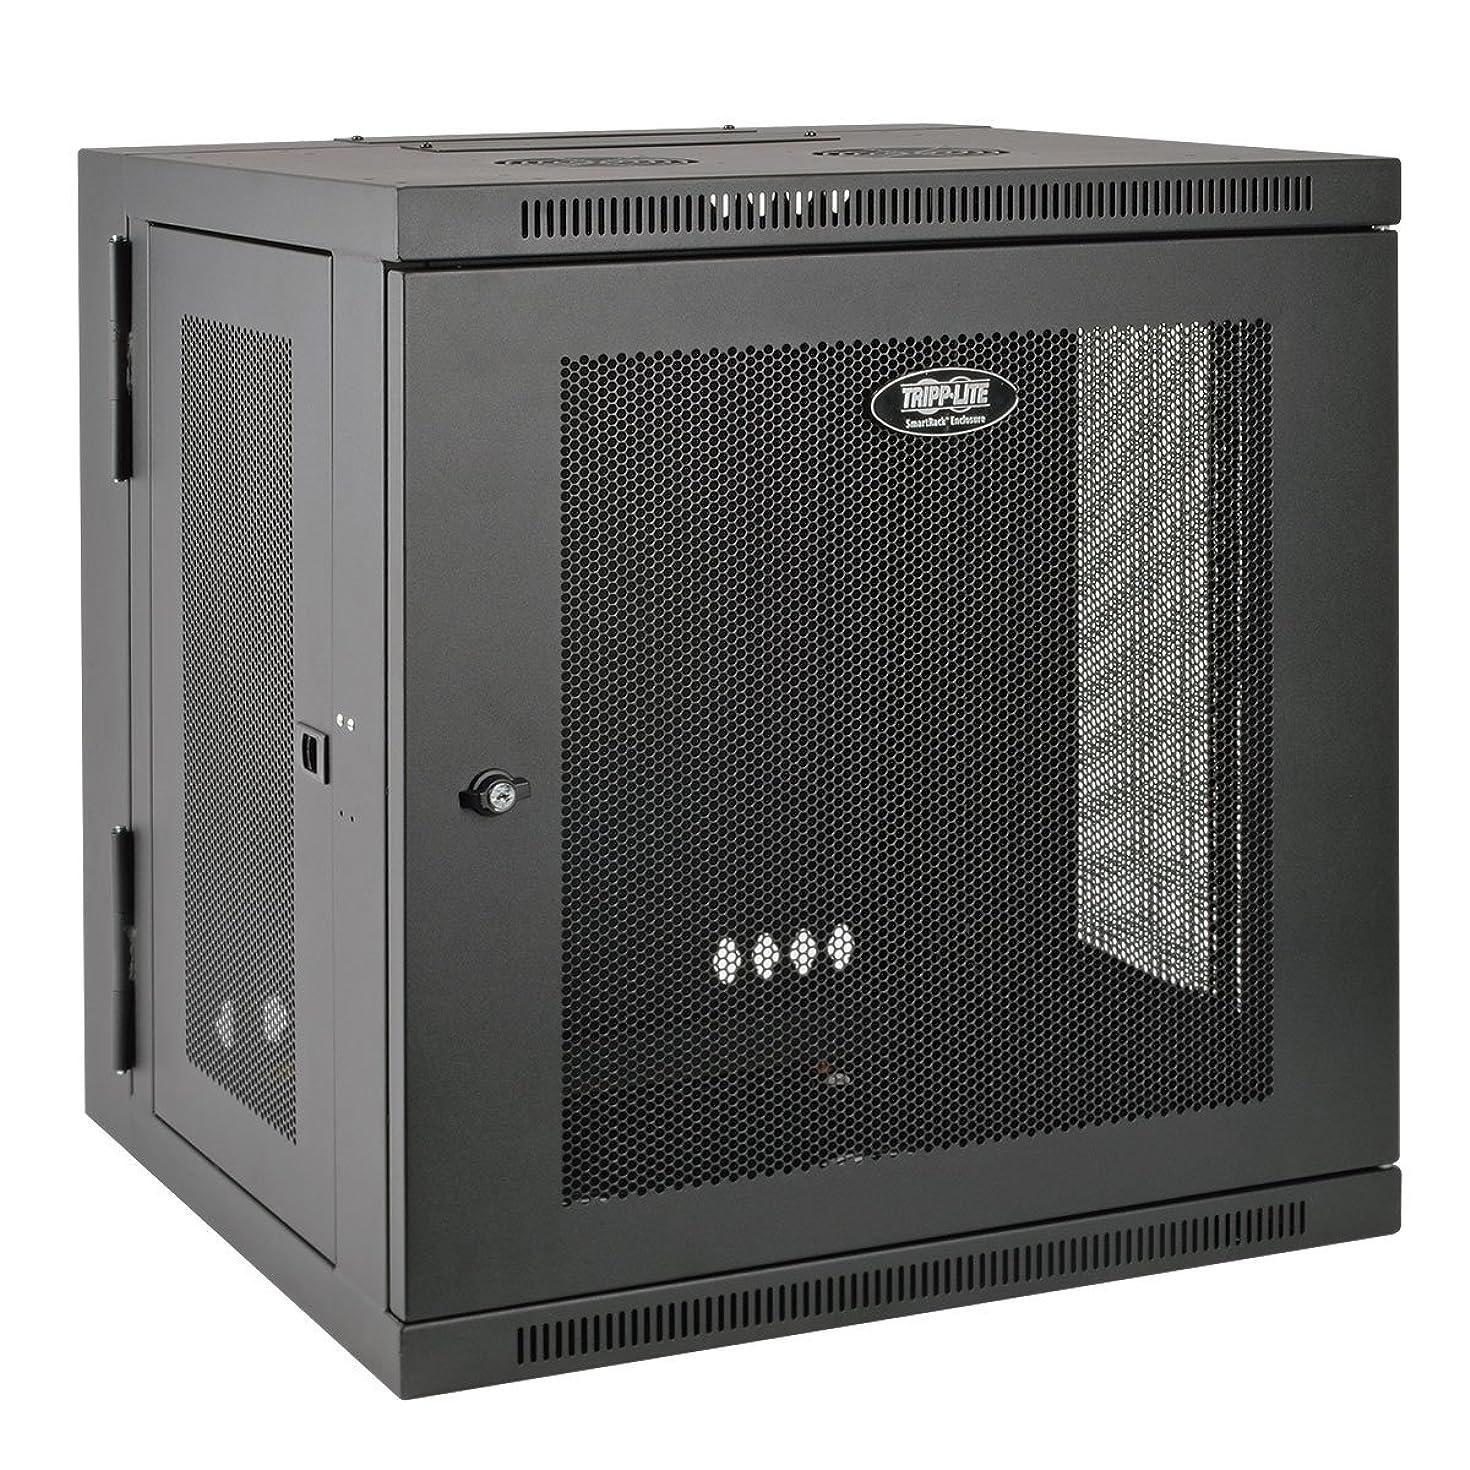 Tripp Lite 10U Wall Mount Rack Enclosure Server Cabinet, Hinged, 20.5